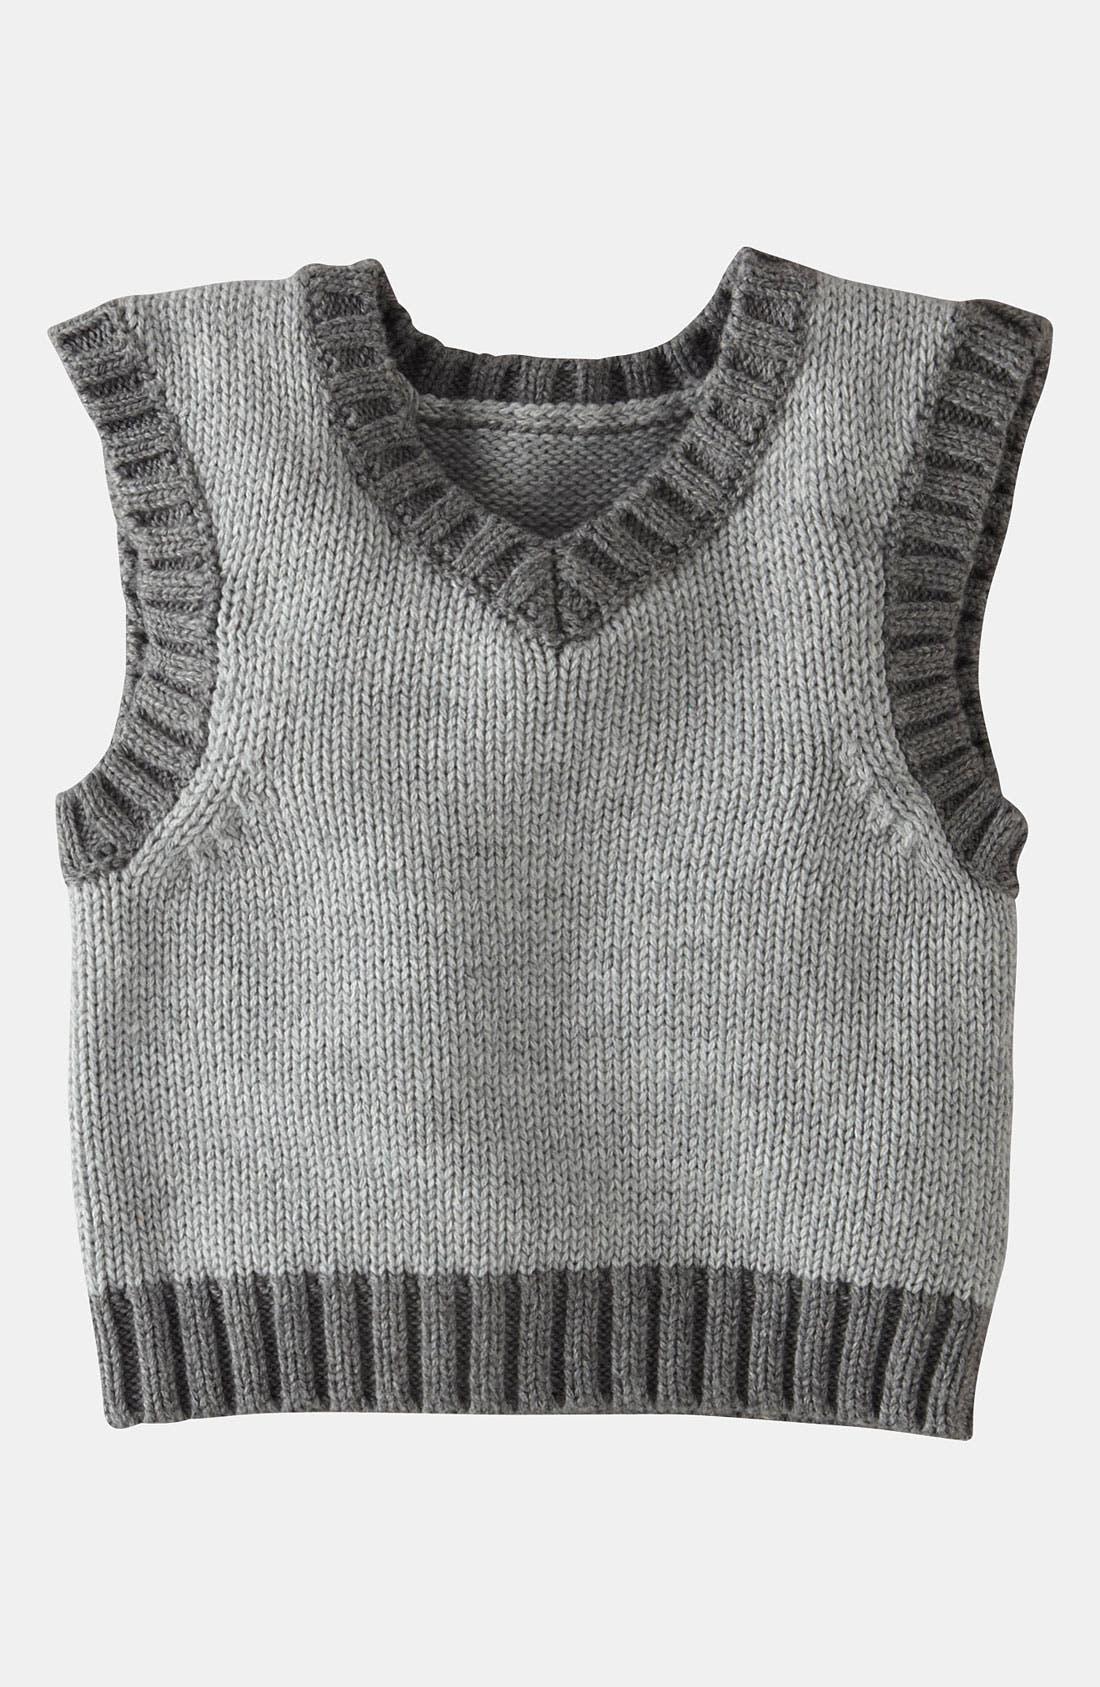 Alternate Image 1 Selected - Mini Boden Knit Vest (Baby)